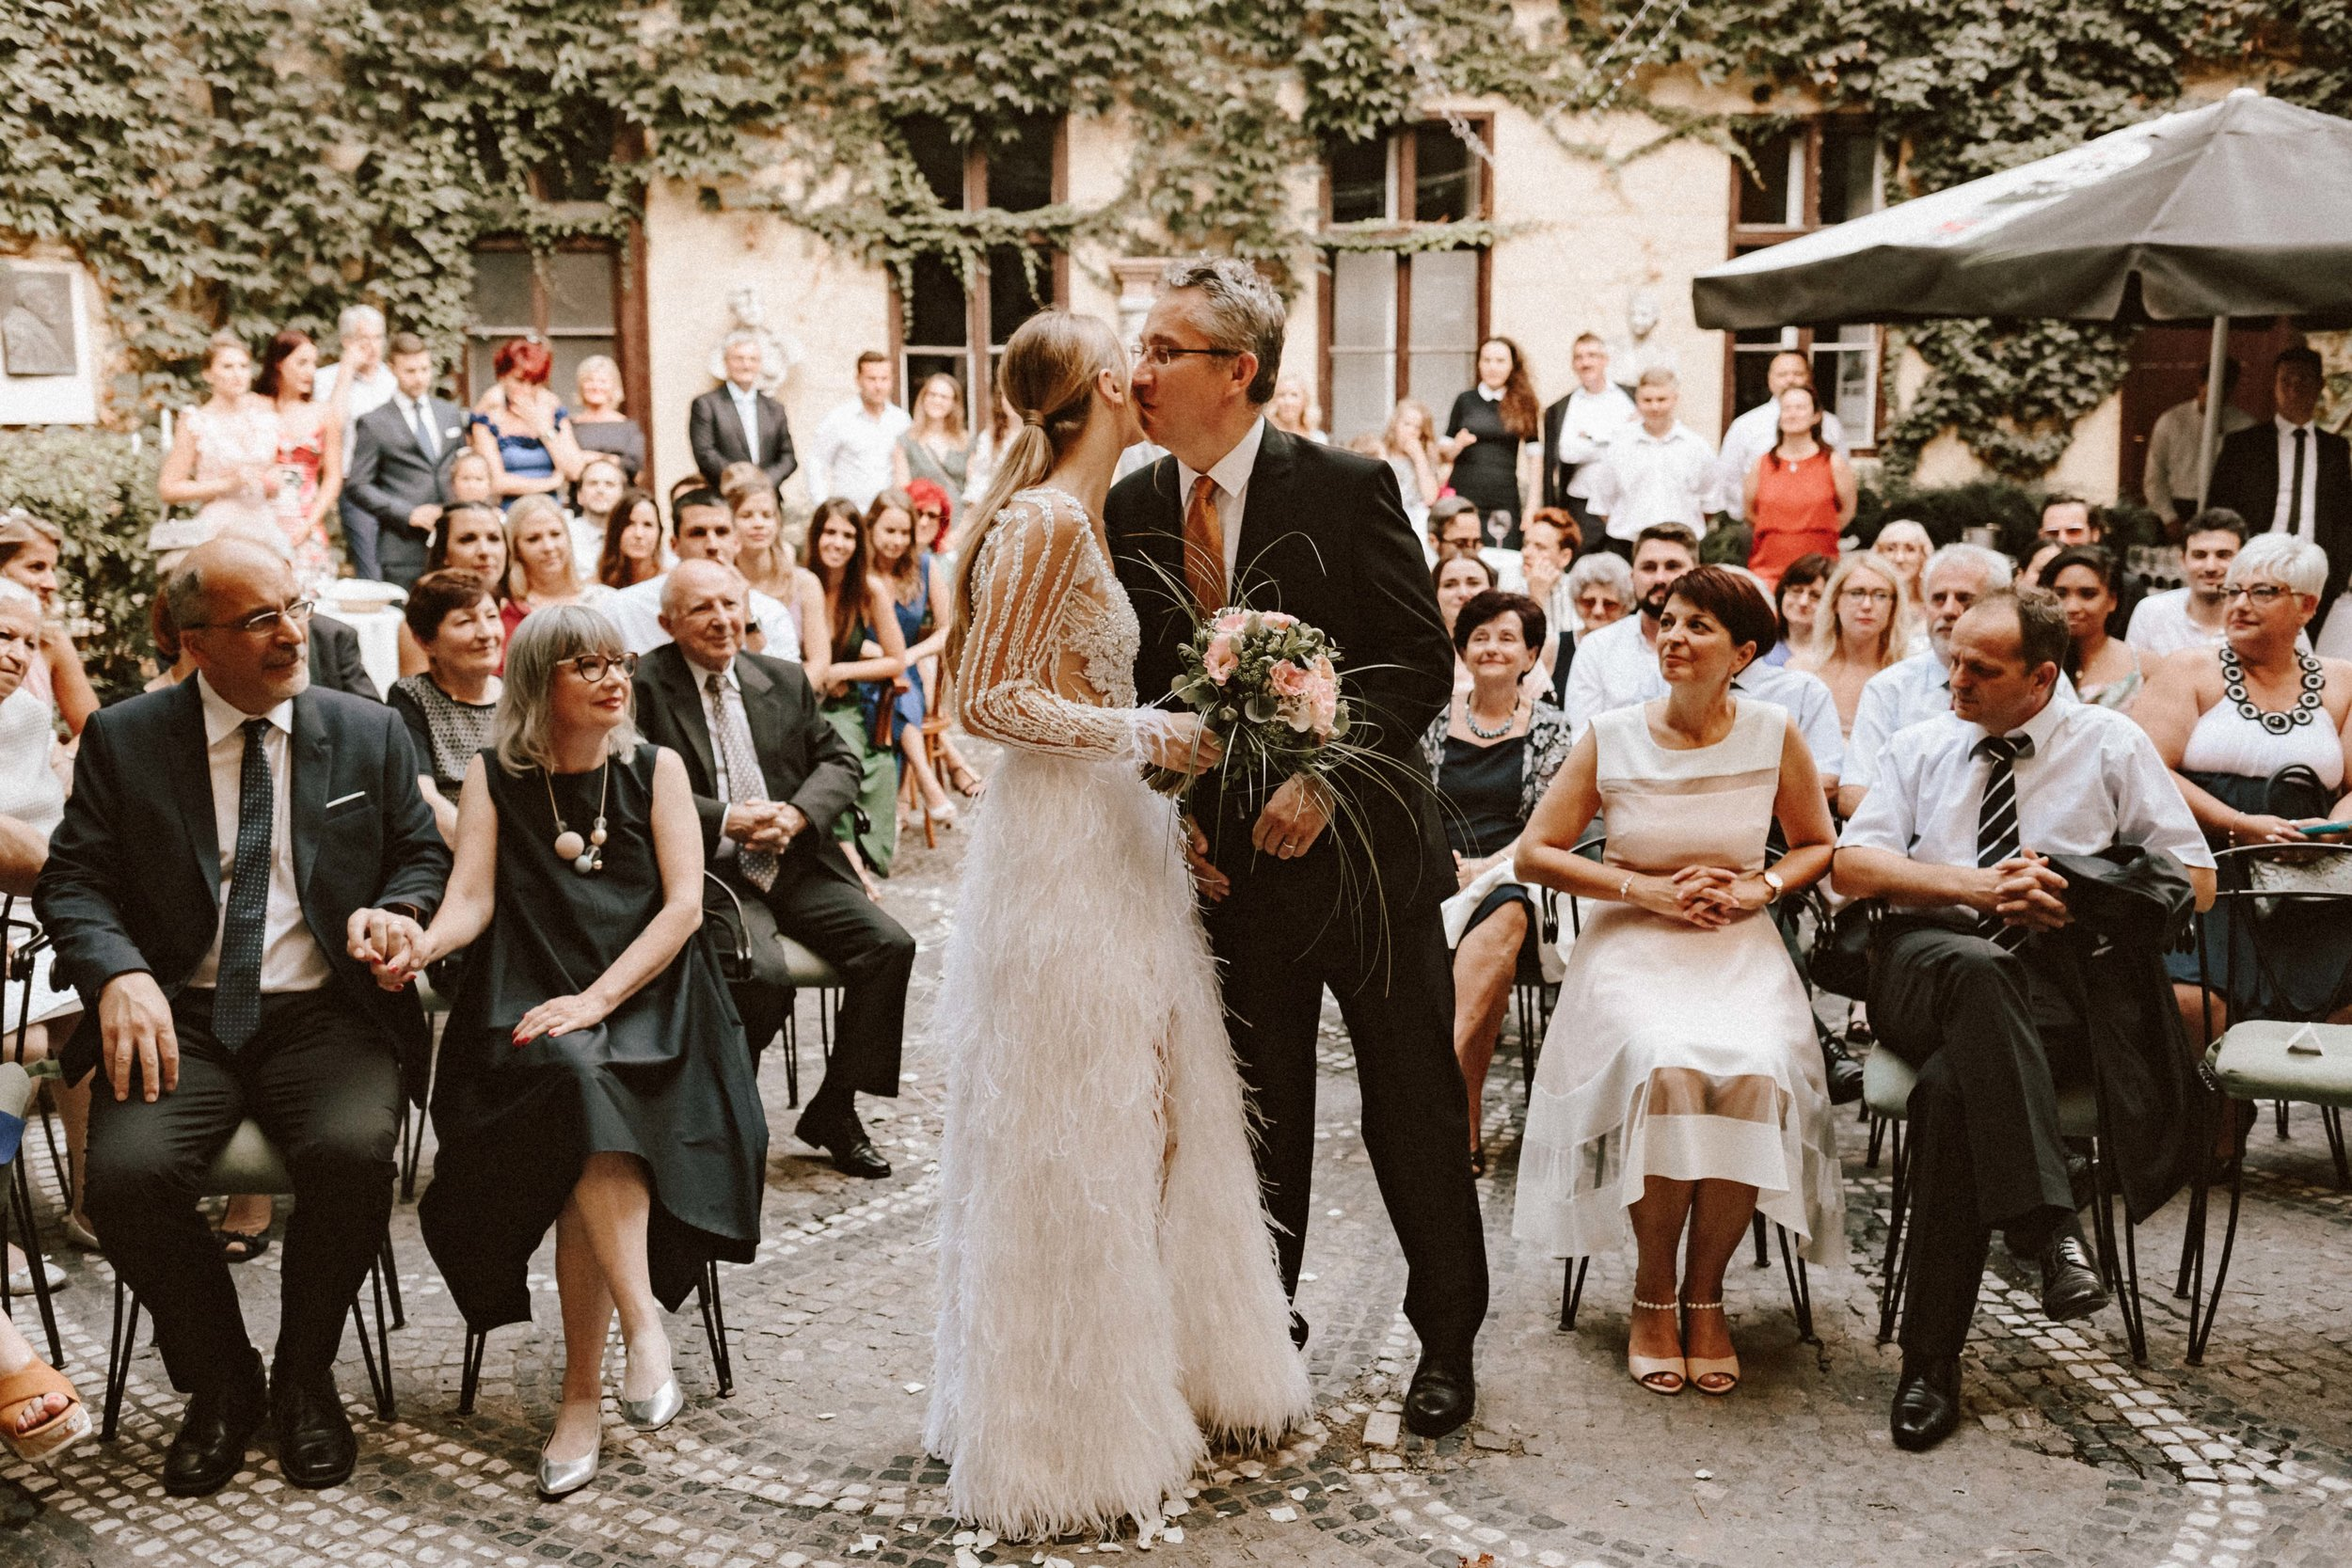 1819-Evelin+Peti-wedding-234-w.jpg